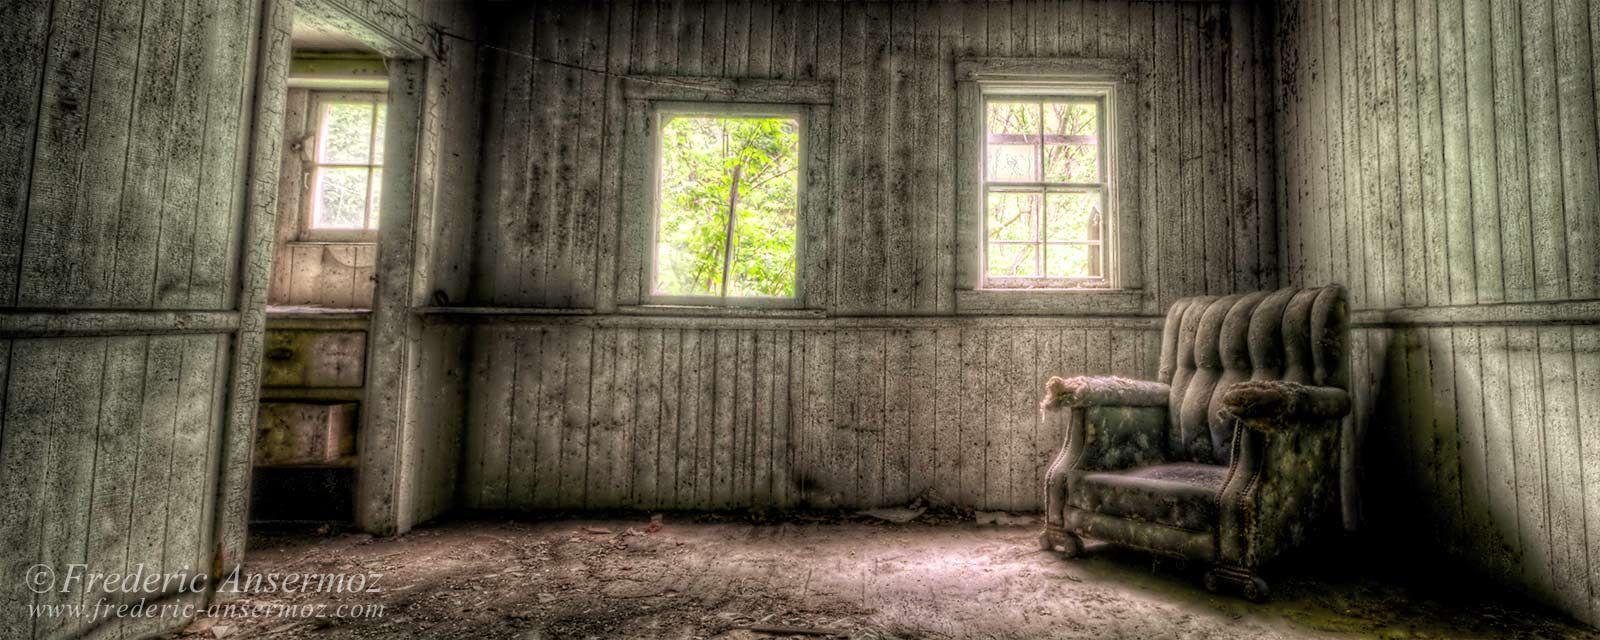 Maison Abandonnee Quebec Maison Abandonnee Maison Photographie Urbaine